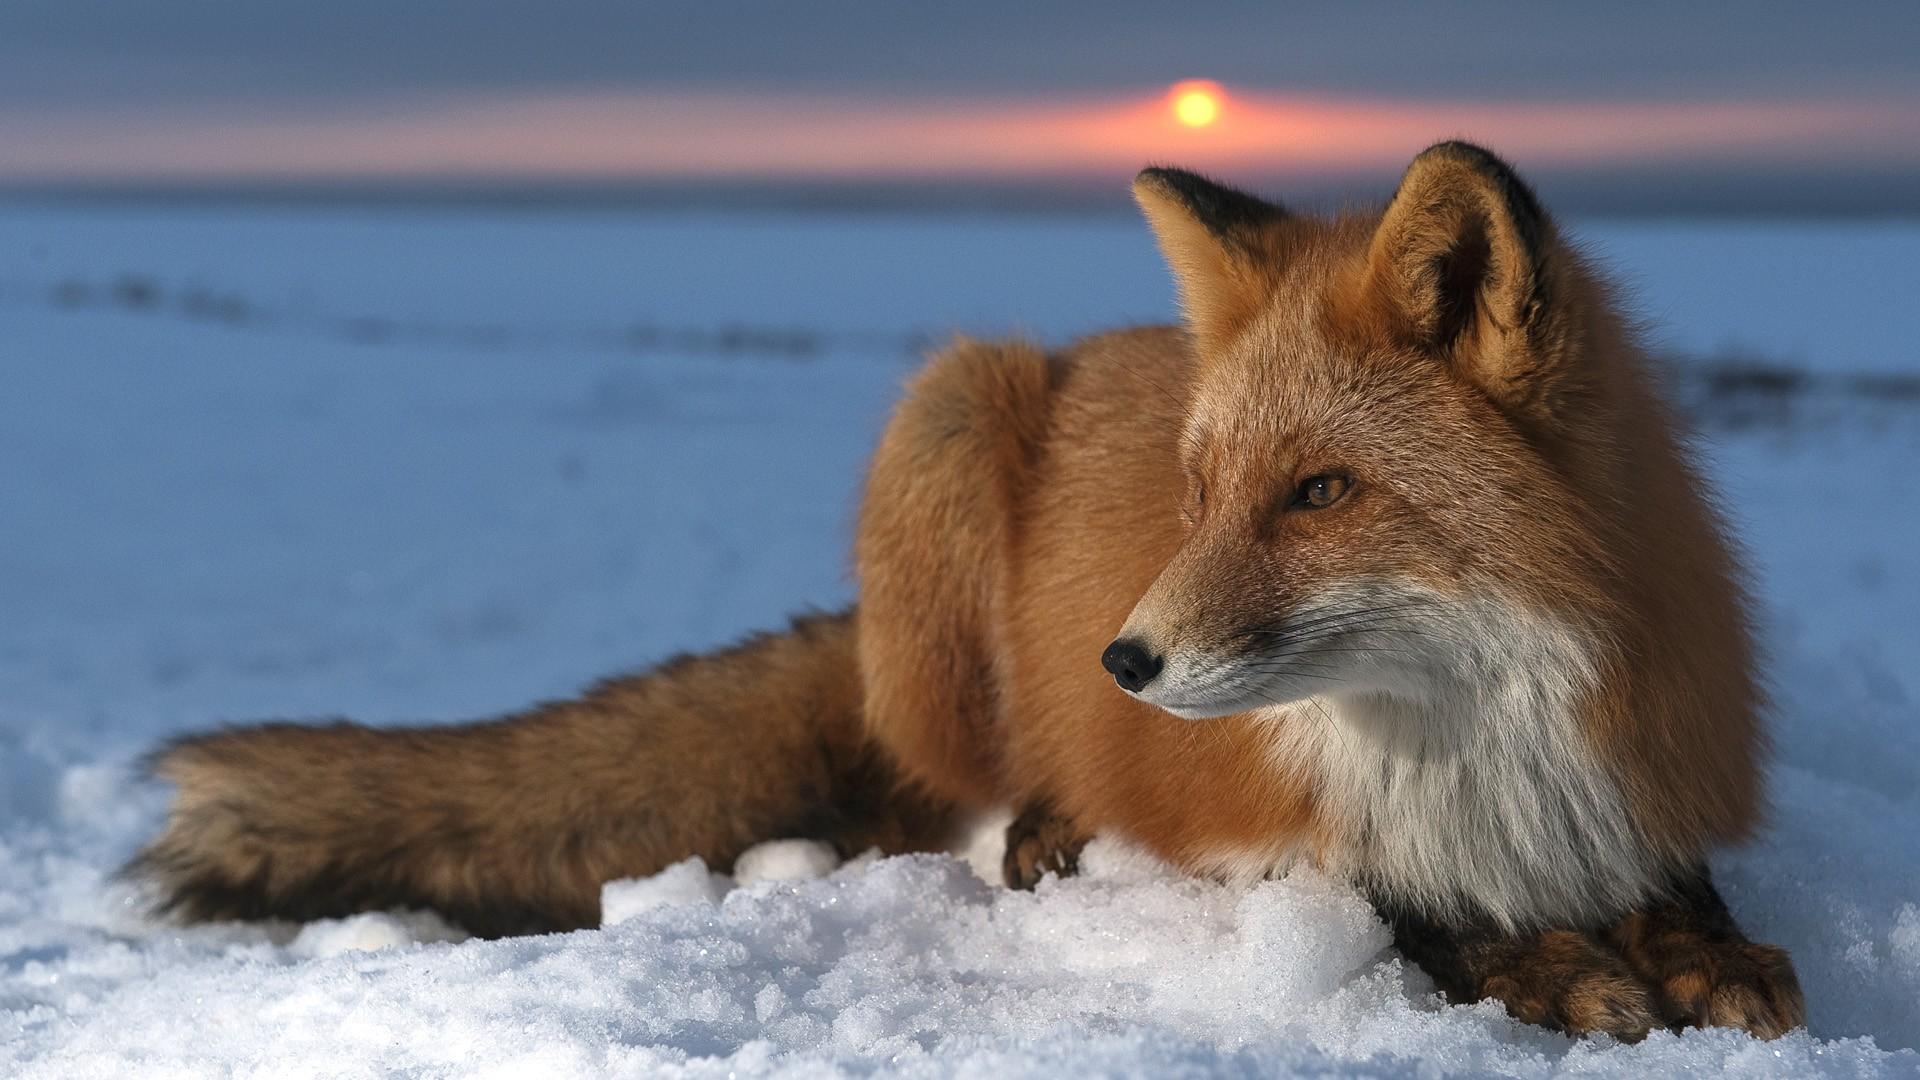 Fox Wallpaper HD